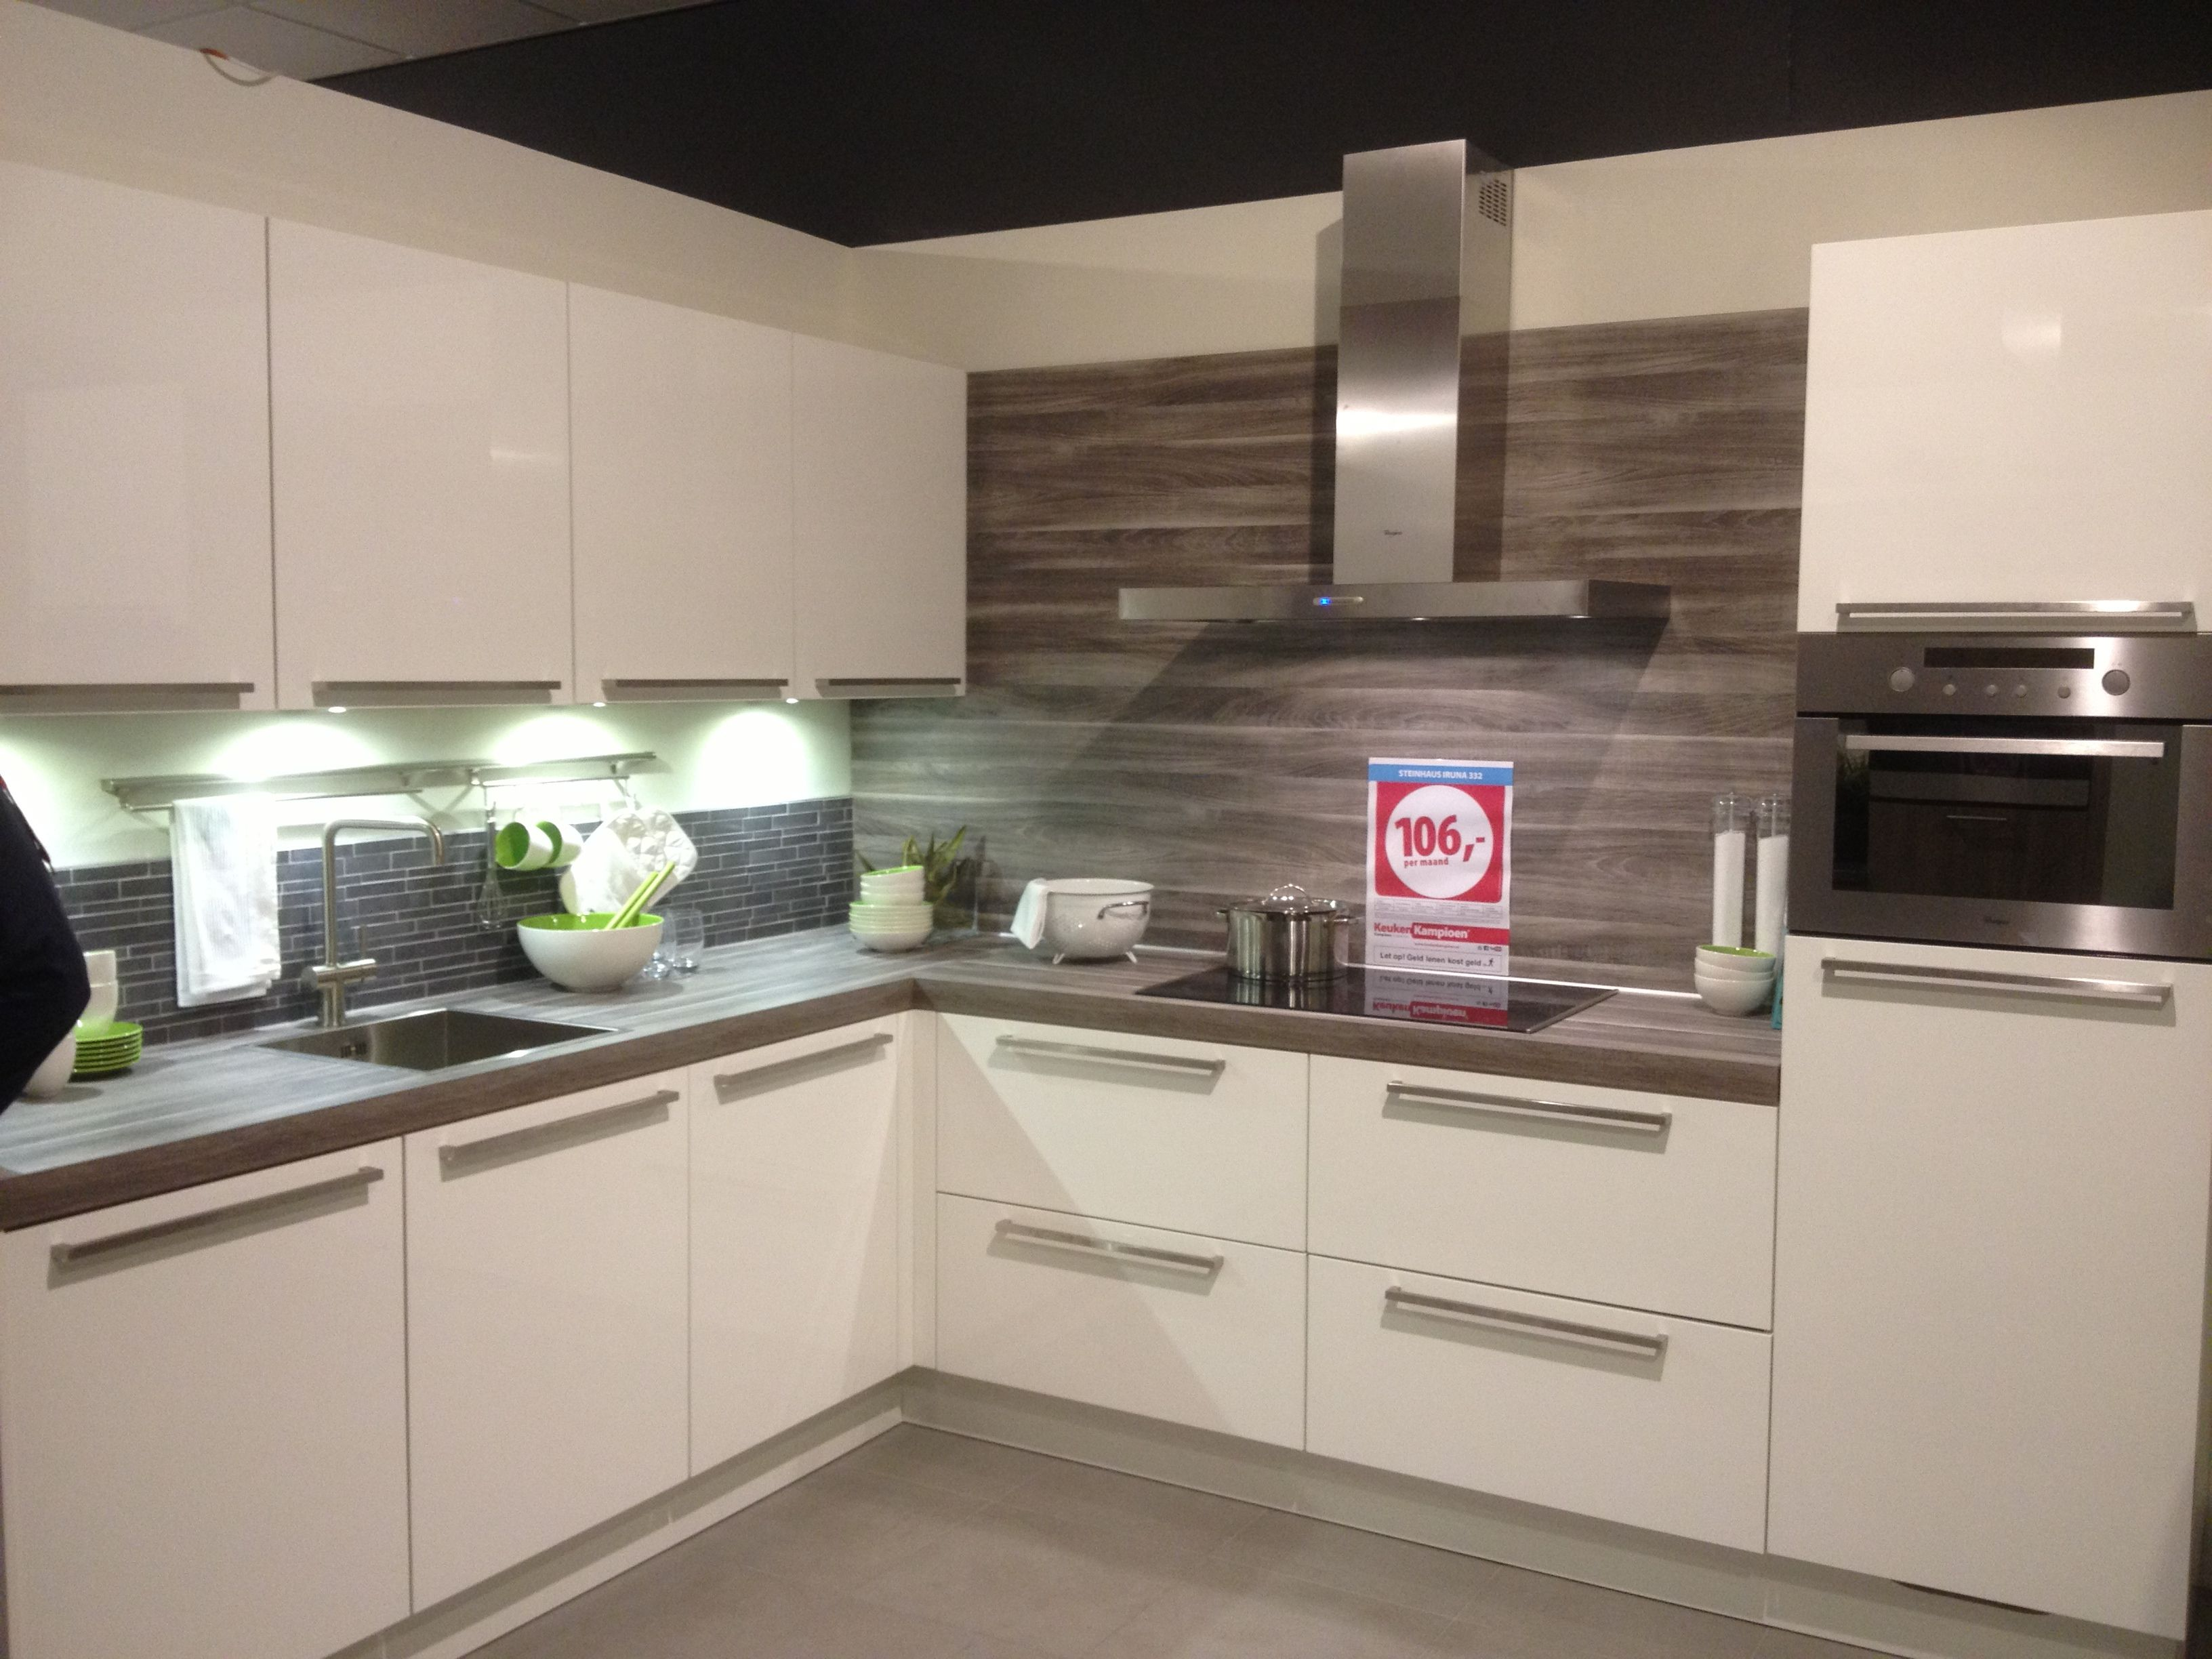 Keuken cocina pinterest kitchens kitchen design and kitchen